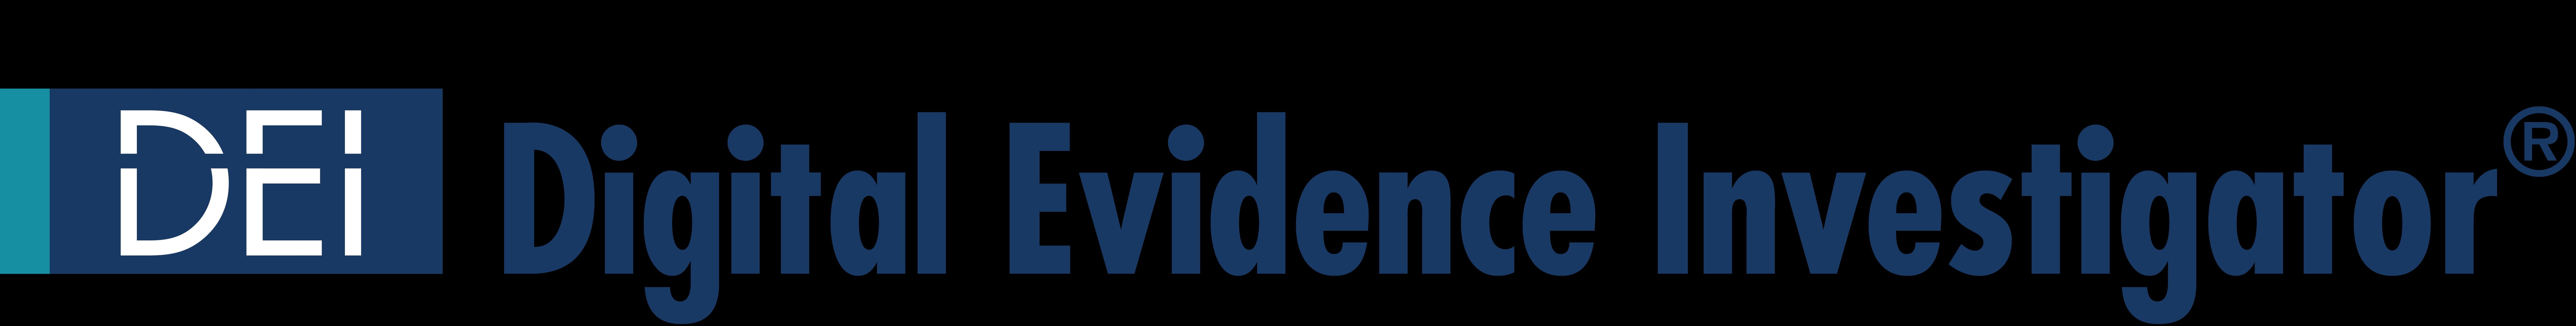 Digital Evidence Investigator Logo